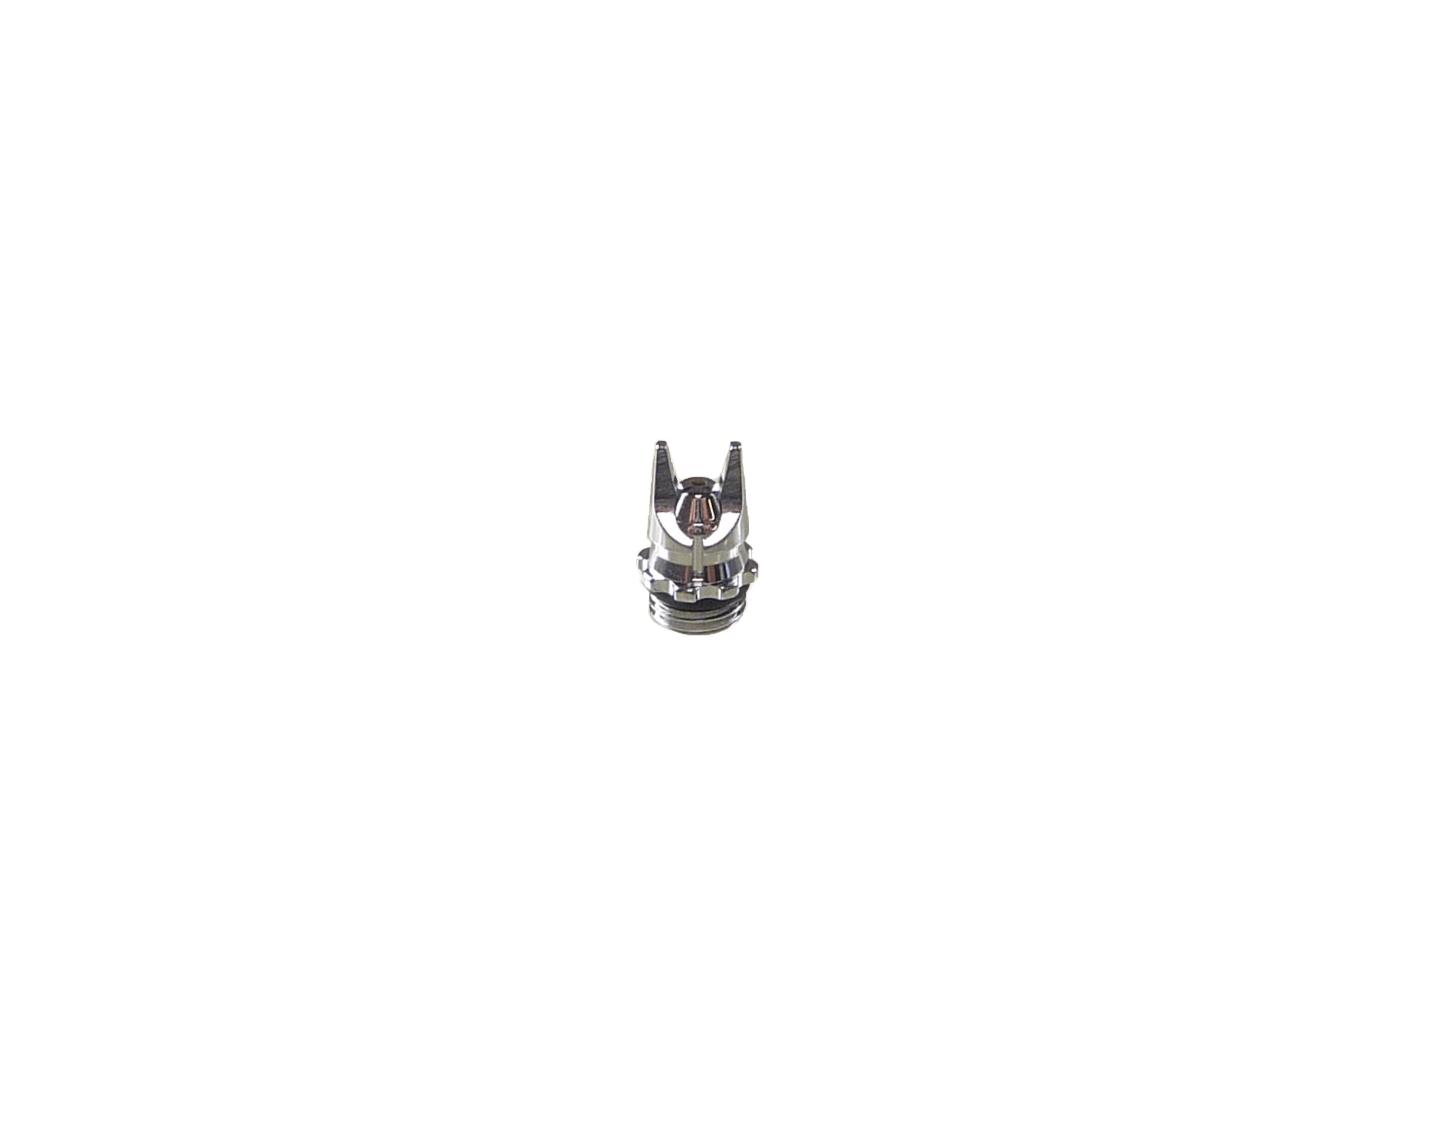 Harder /& Steenbeck Fineline CRPlus 0.4mm Air Cap # 126794